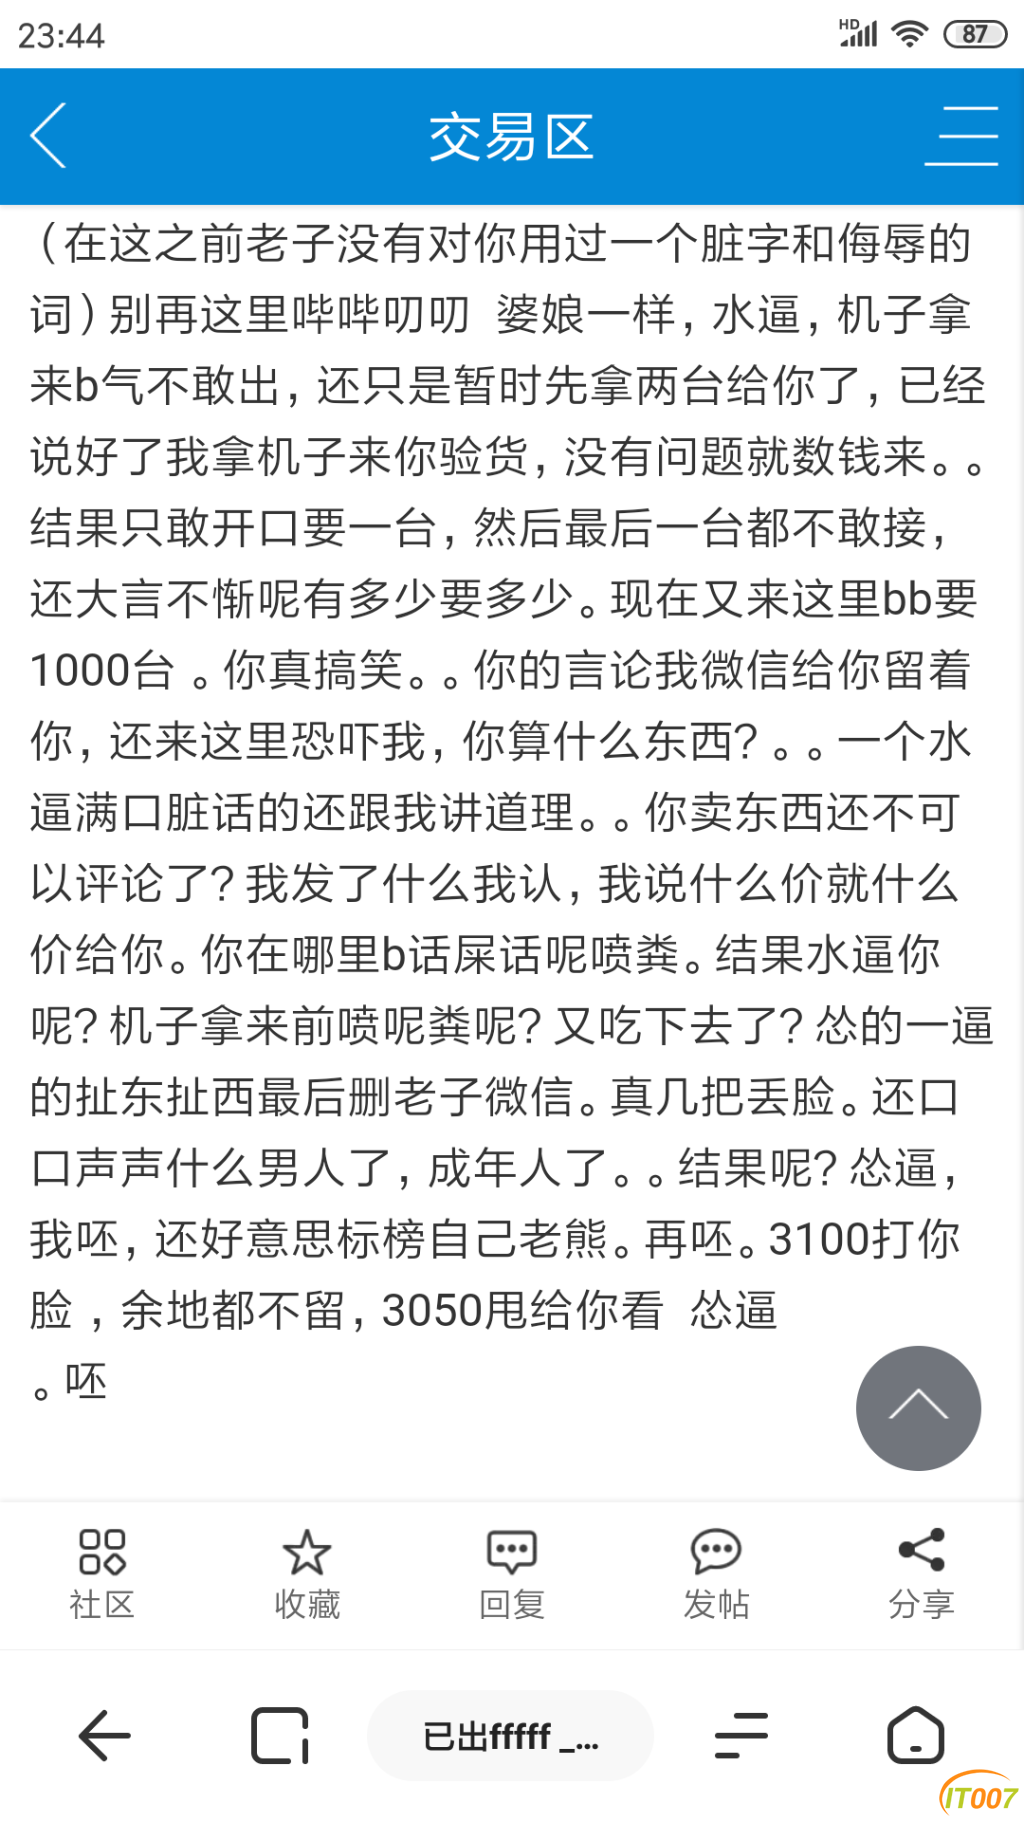 Screenshot_2019-04-21-23-44-29-680_com.quark.browser.png